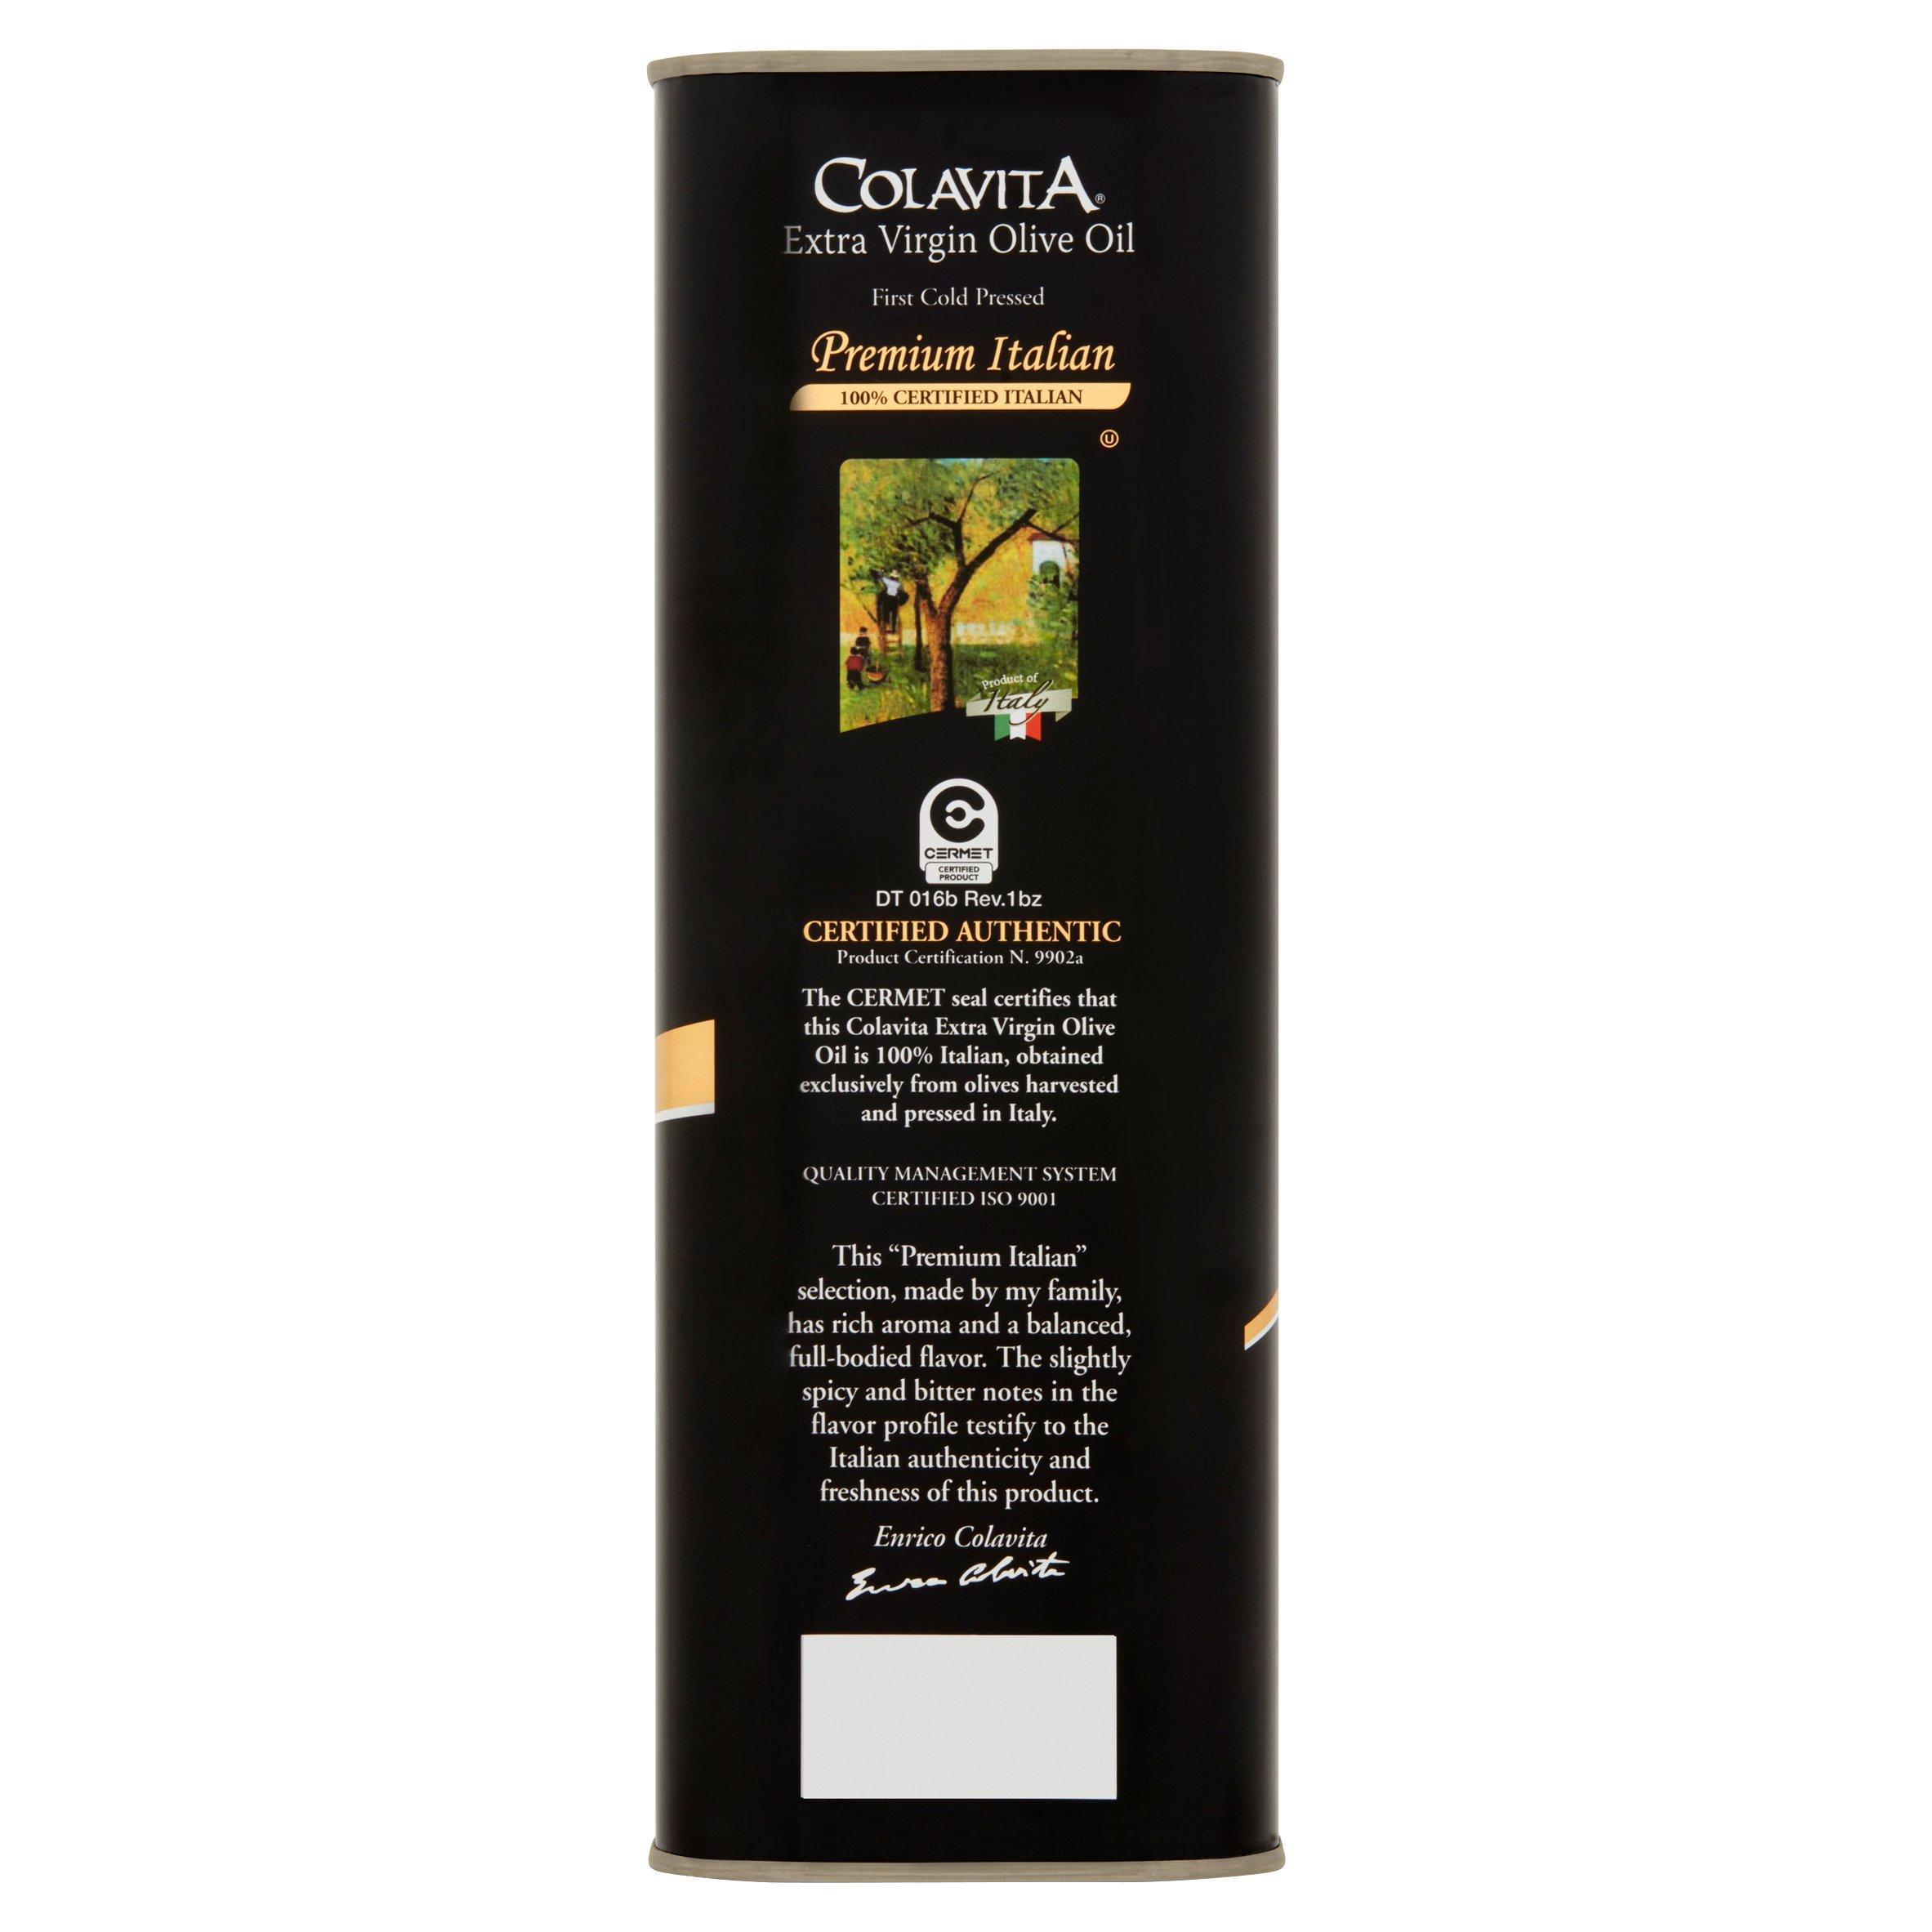 Colavita premium italian extra virgin olive oil 1014 fl oz colavita premium italian extra virgin olive oil 1014 fl oz walmart xflitez Gallery